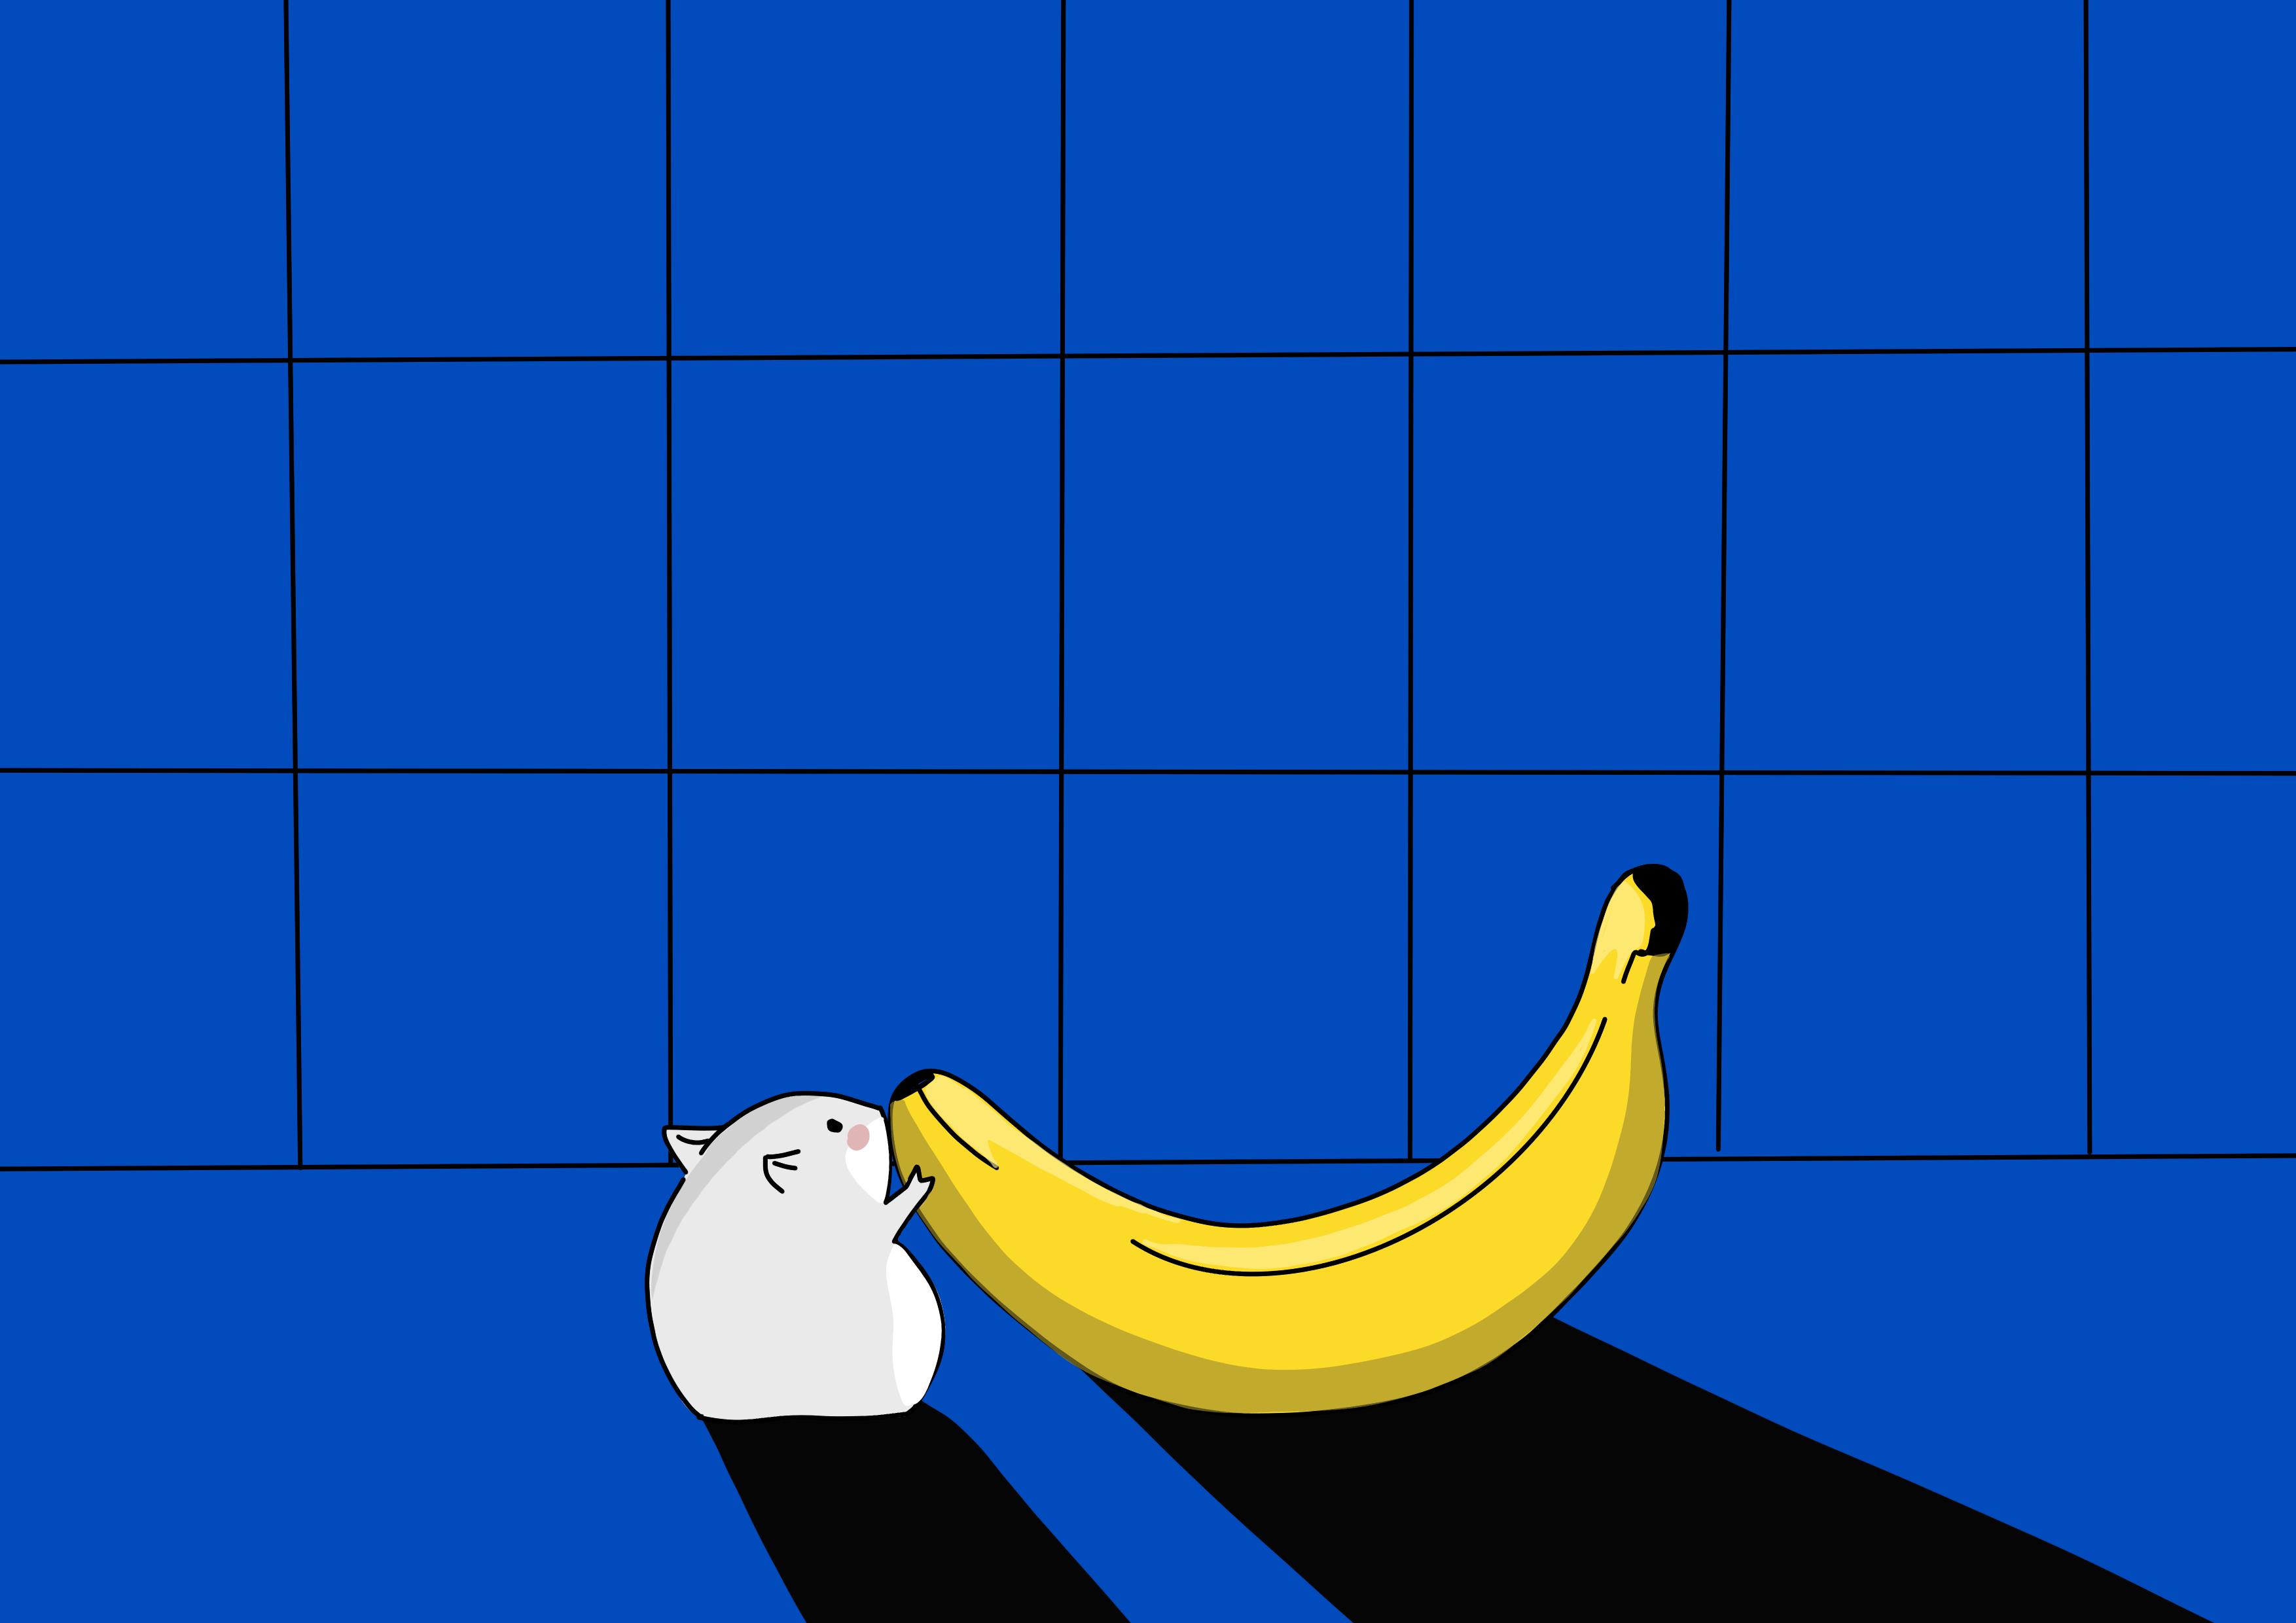 Иллюстрация_без_названия